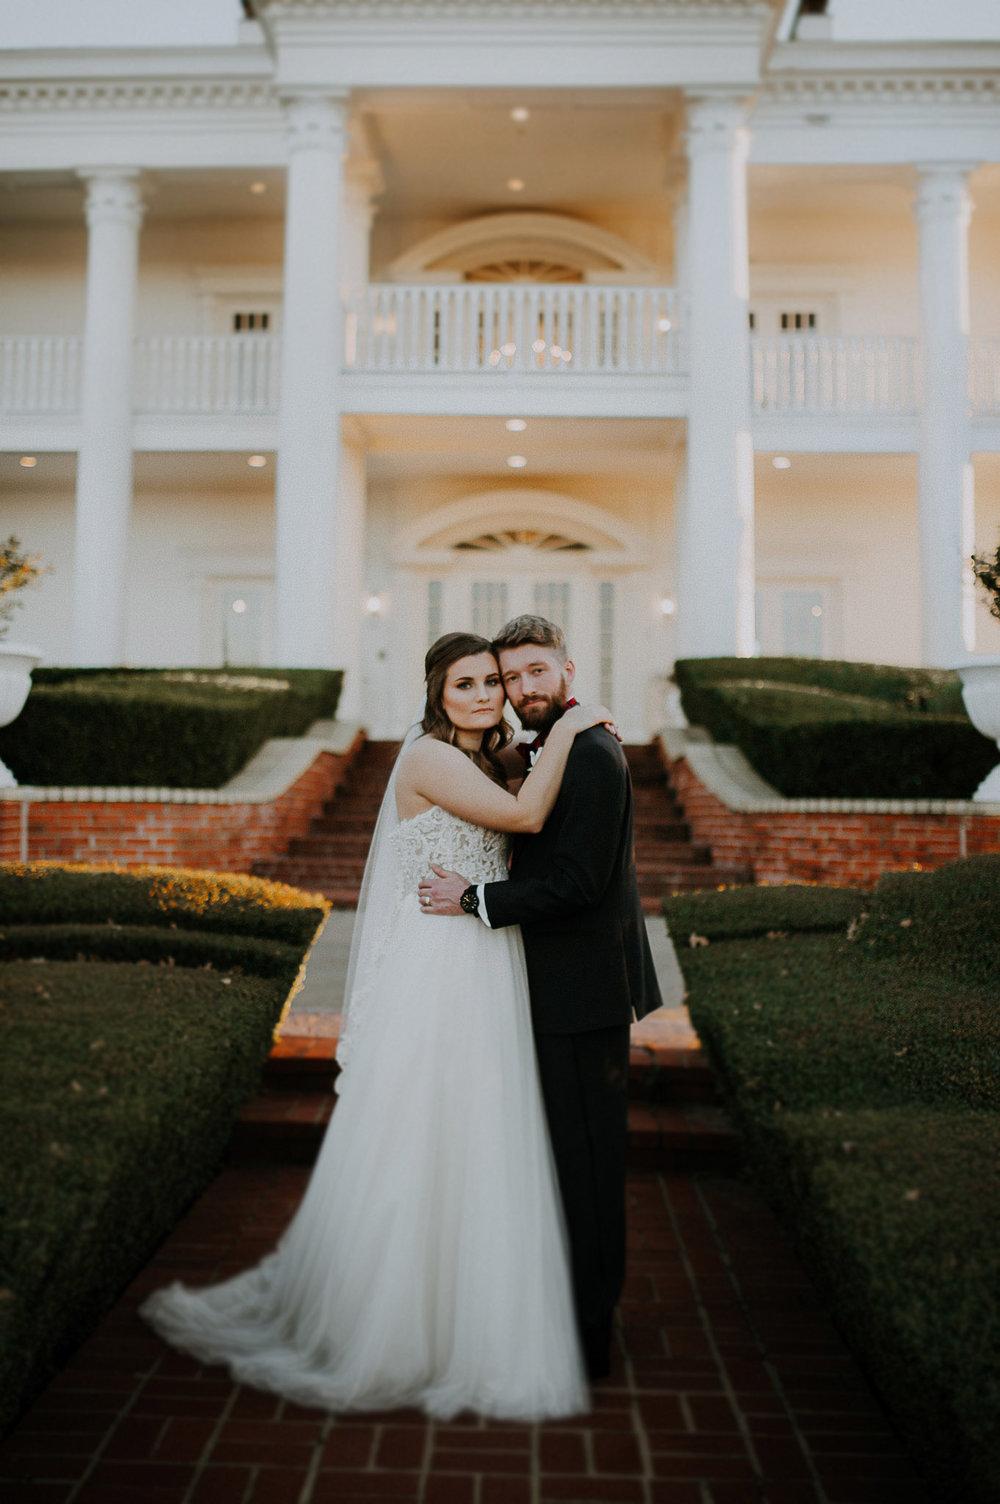 Dallas_Fort_Worth_wedding_Photographer_lone_star_mansion_burleson_texas_104